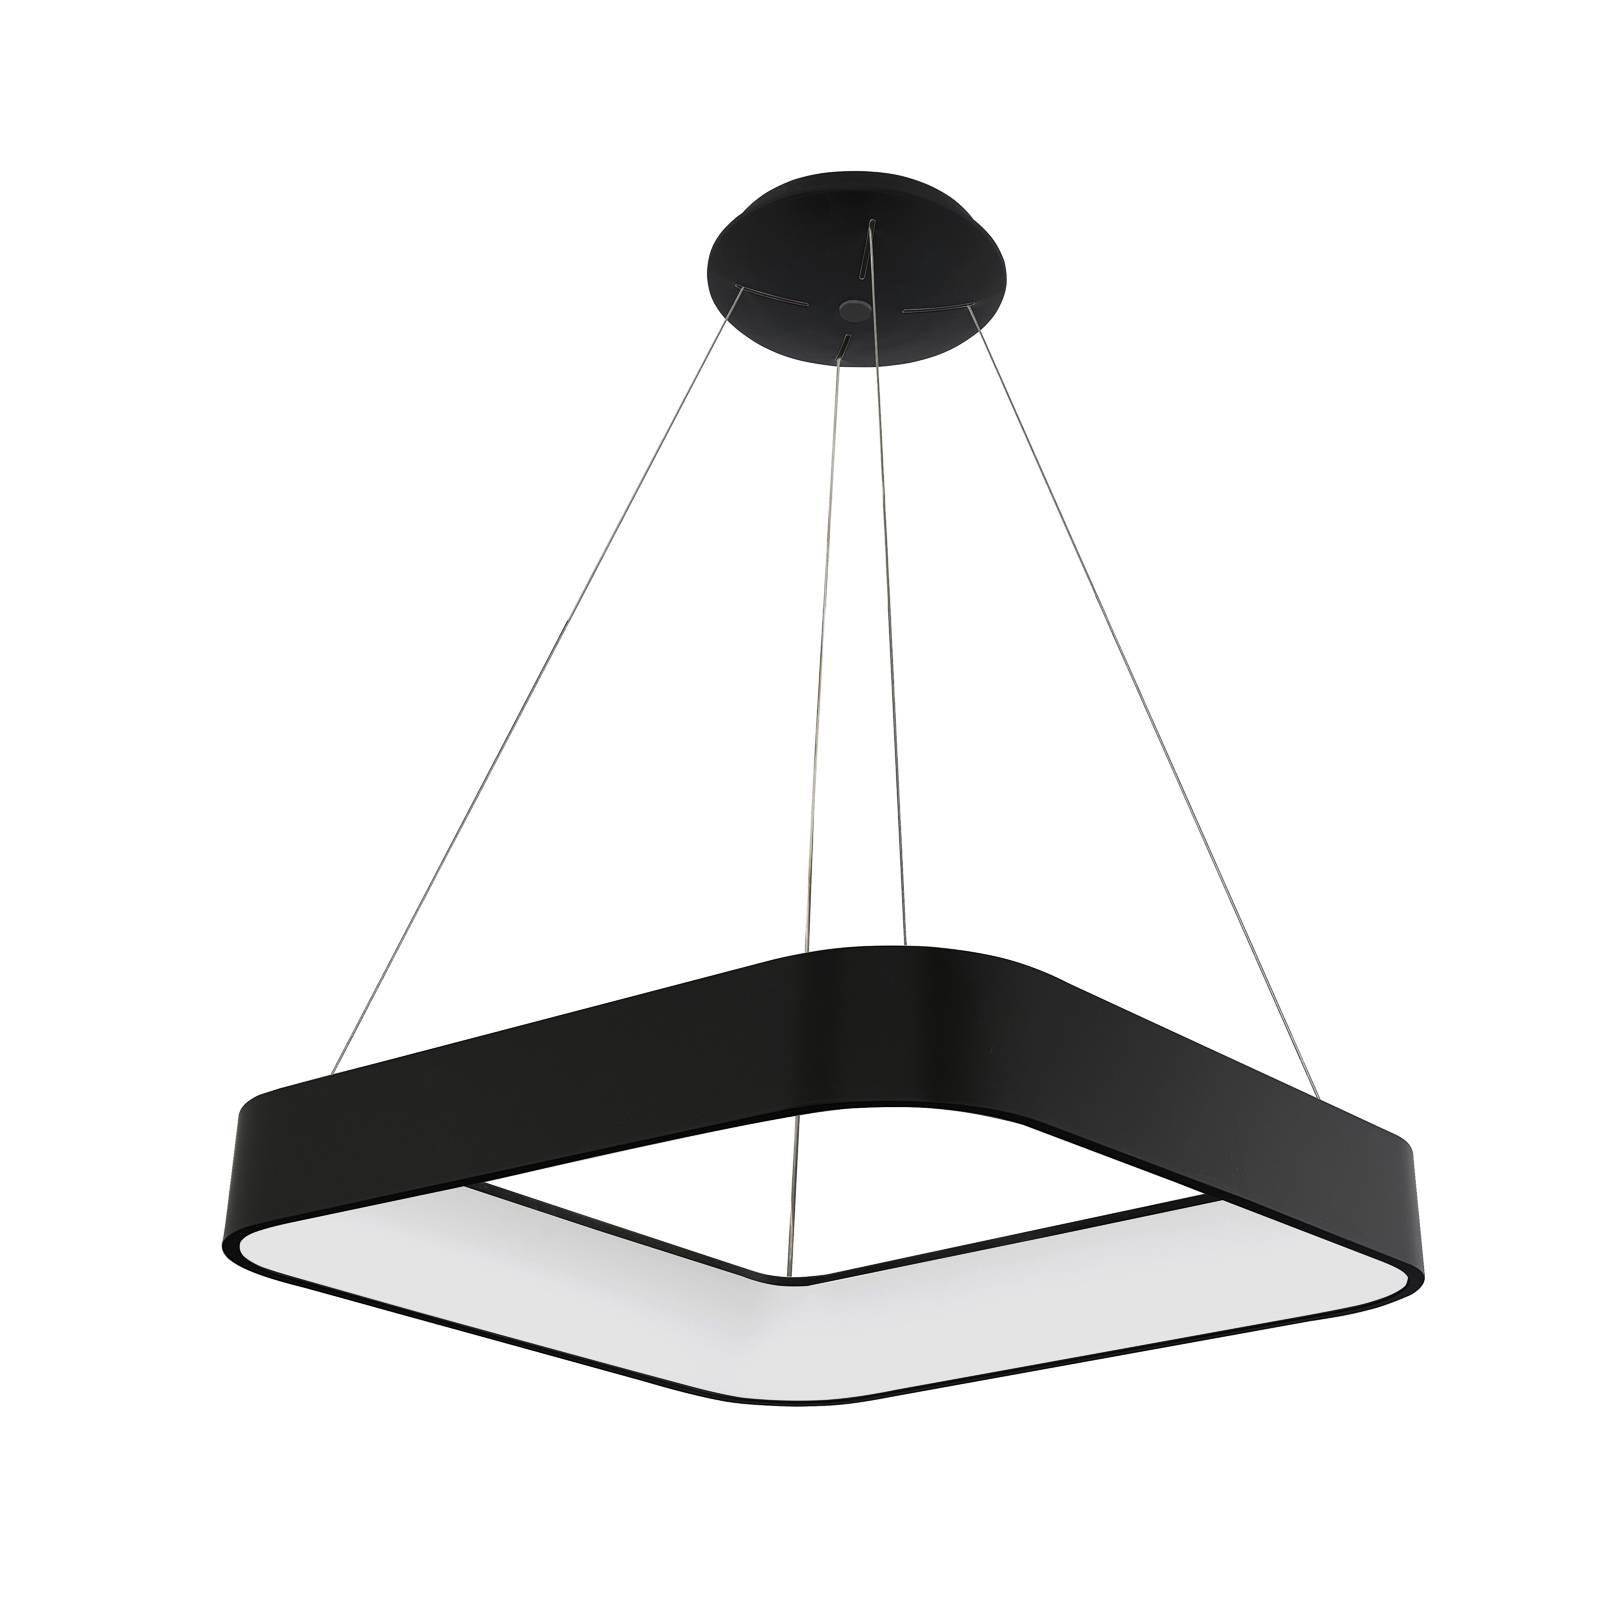 Arcchio Aleksi -LED-riippuvalaisin, 60 cm kulmikas